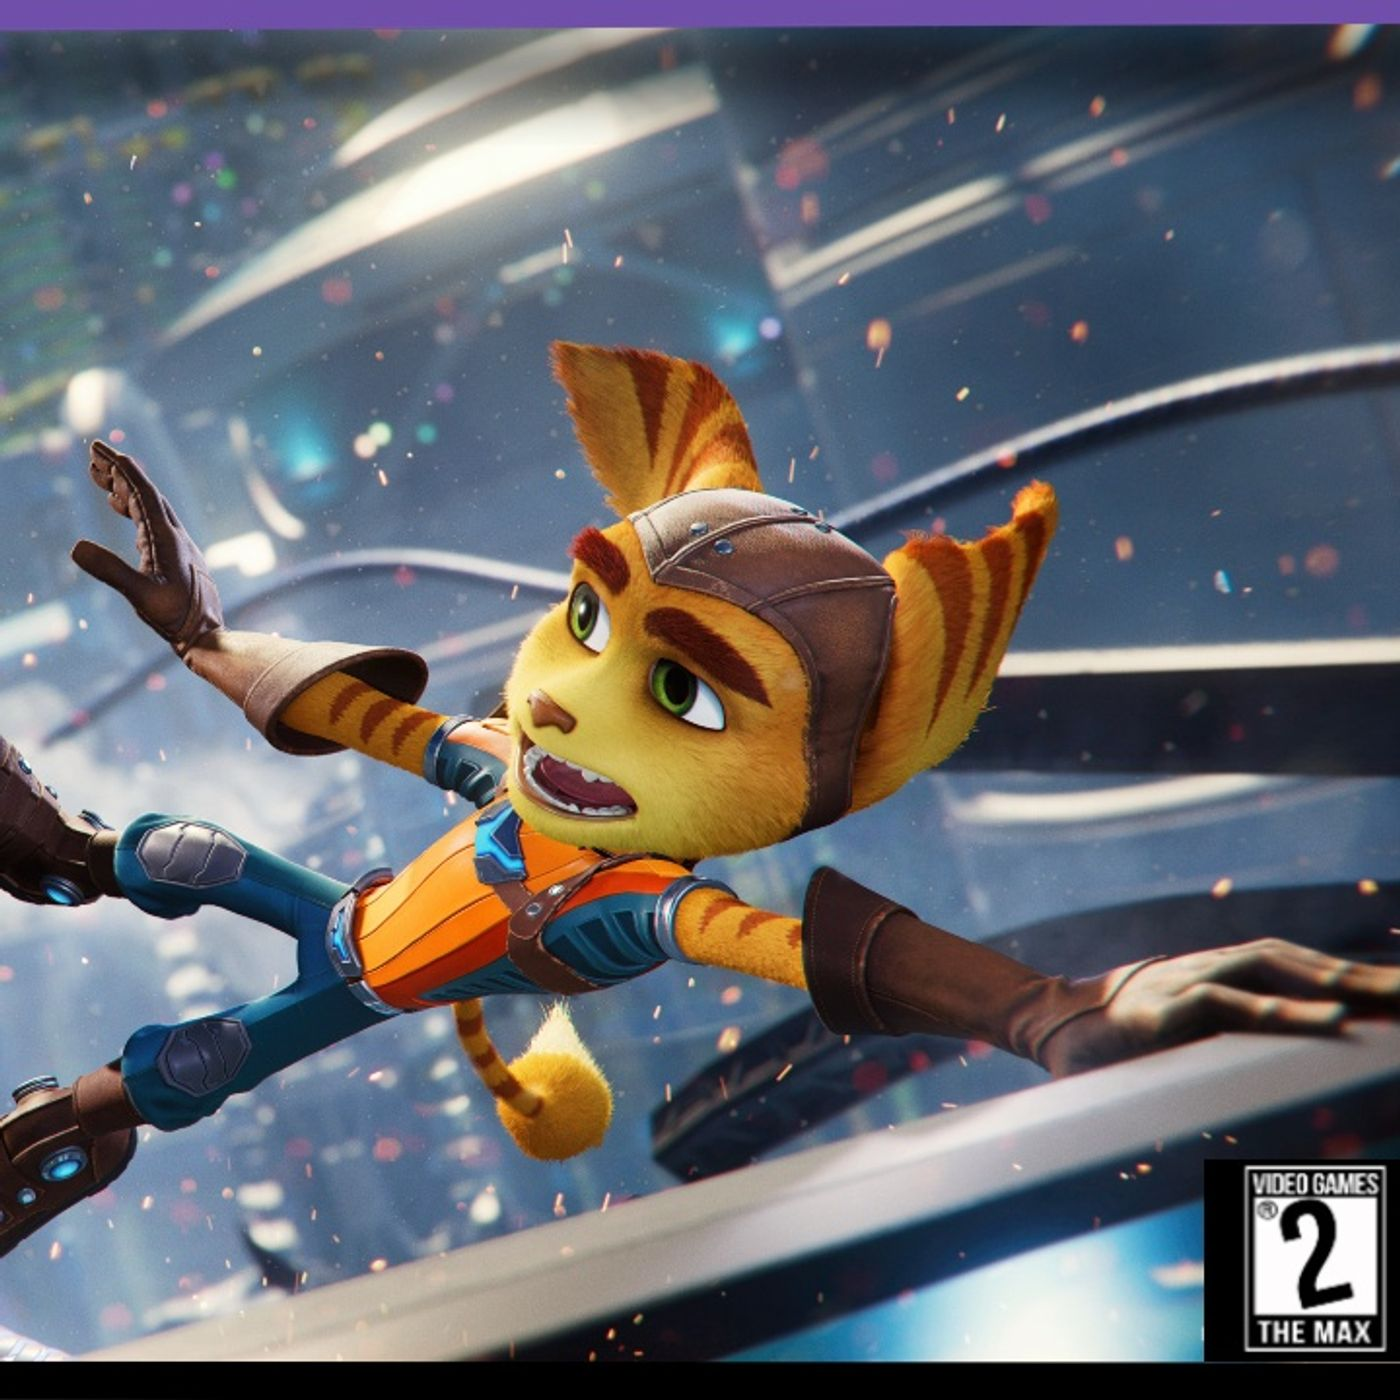 The Best Games of 2021 So Far (w/ Jakejames Lugo) - VG2M # 278